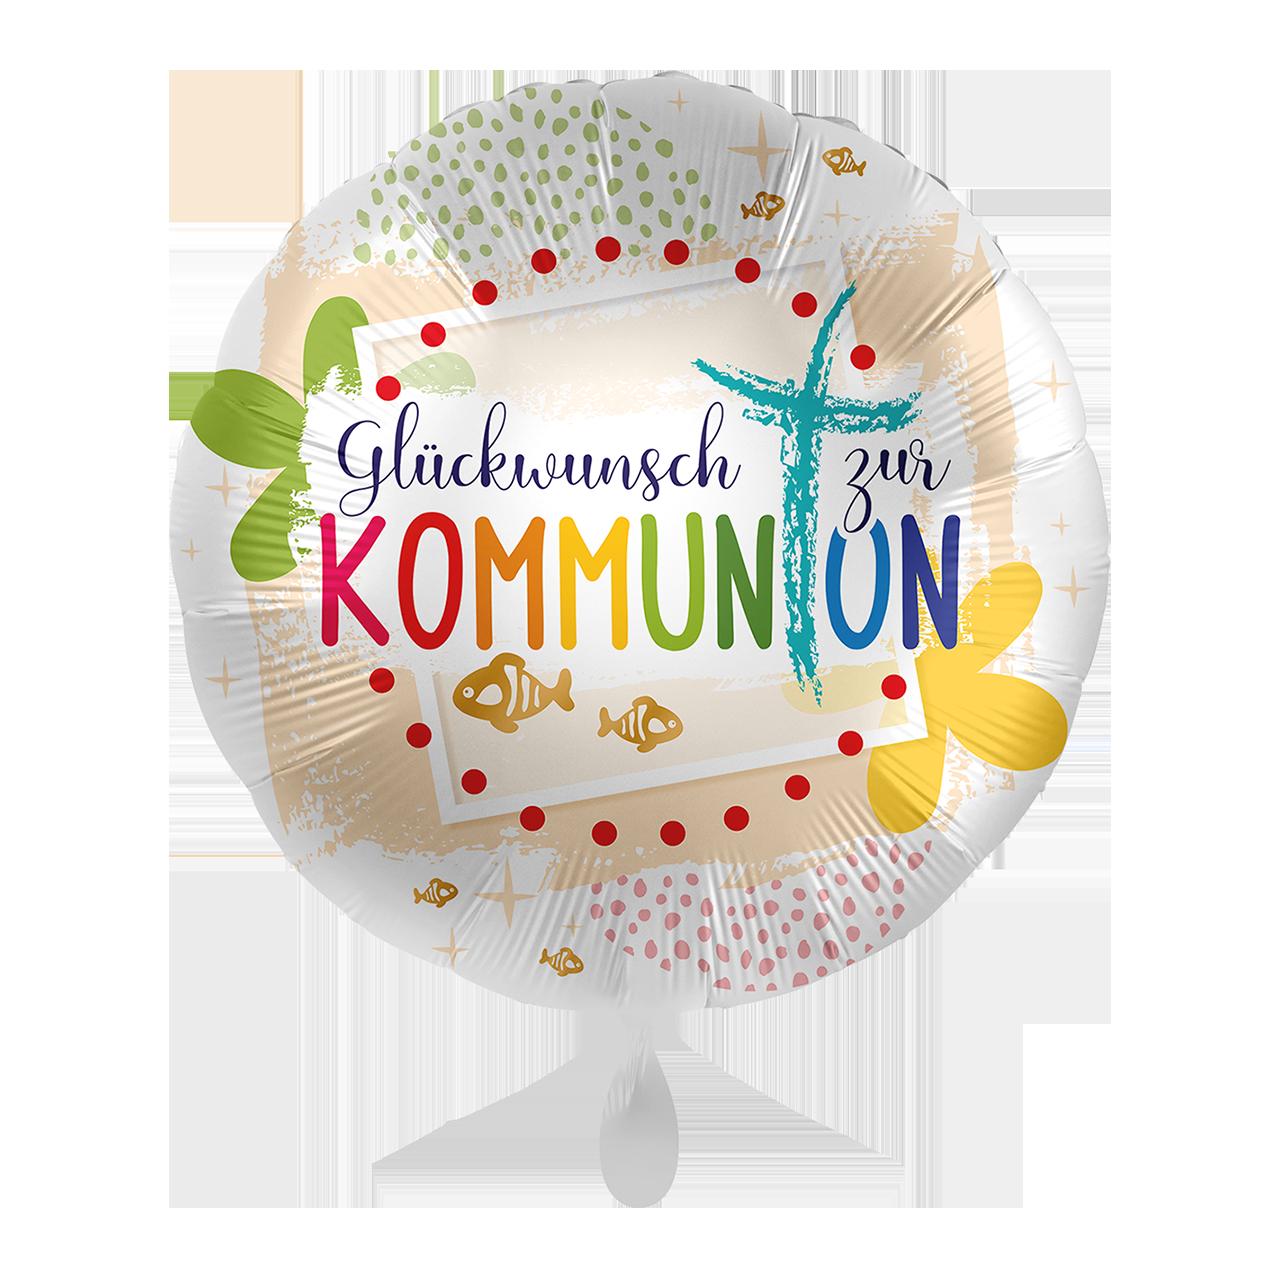 Folienballon Kommunion Glückwunsch - 65293